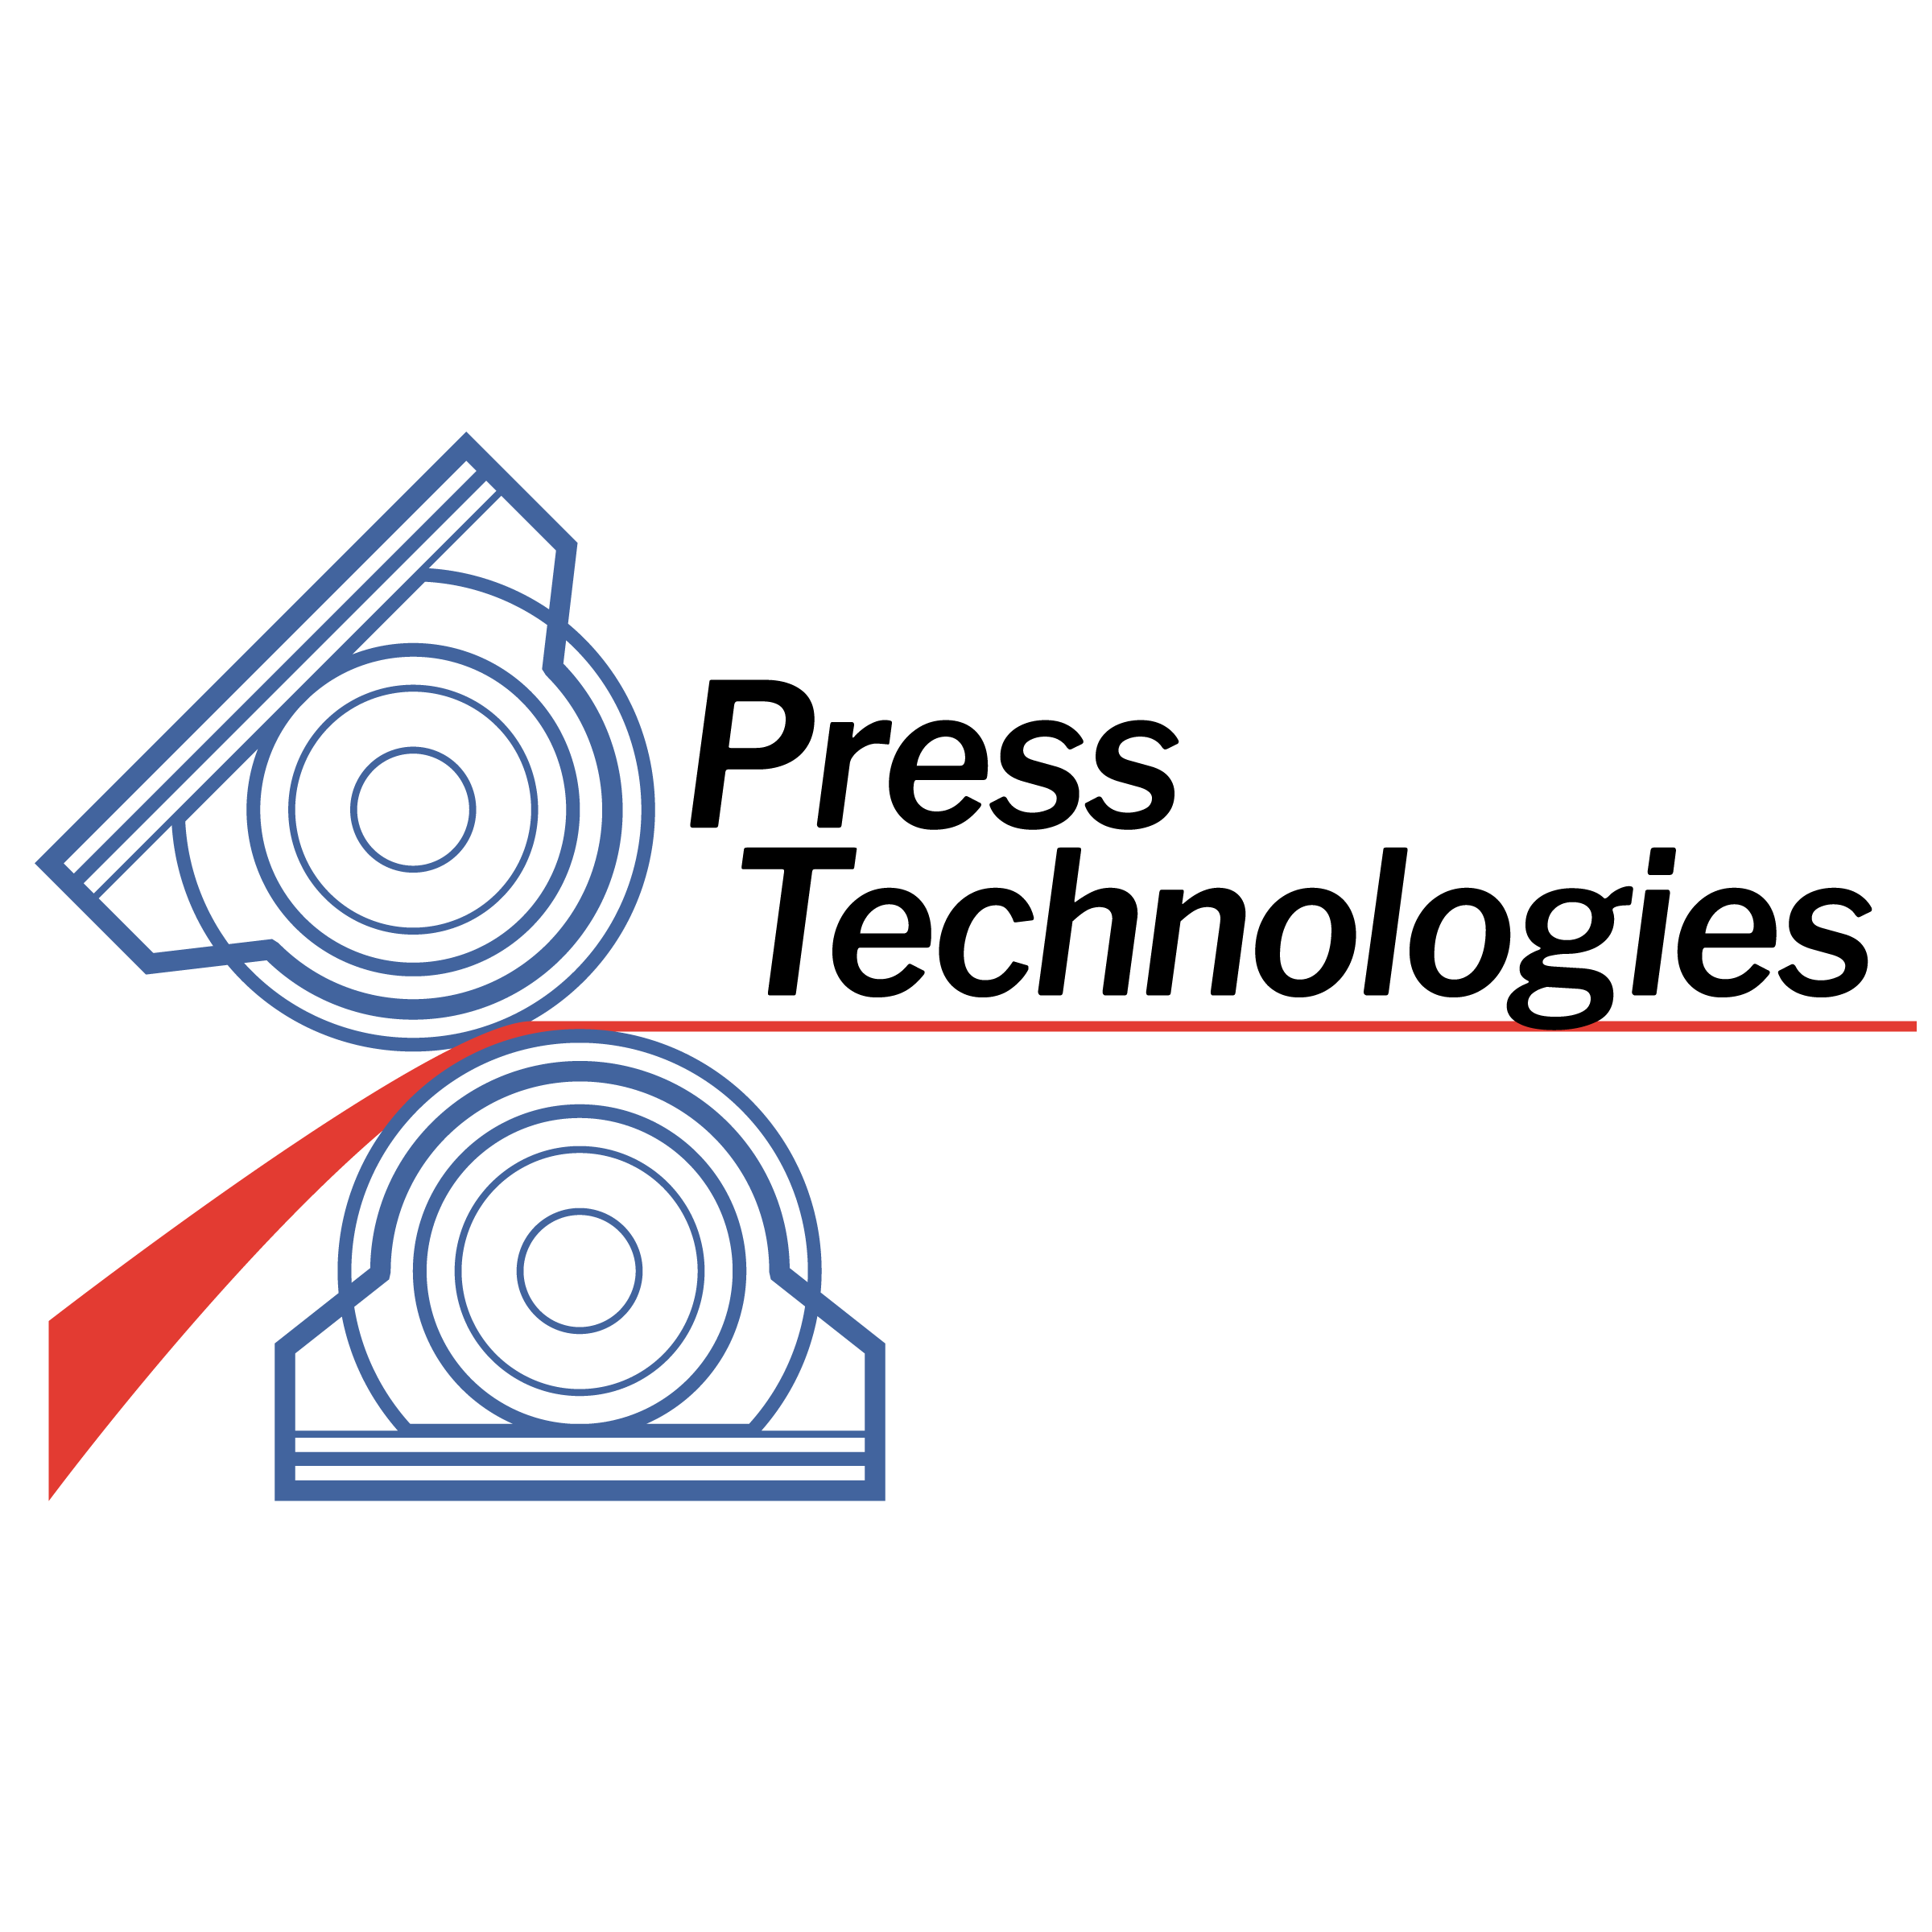 Press Technologies